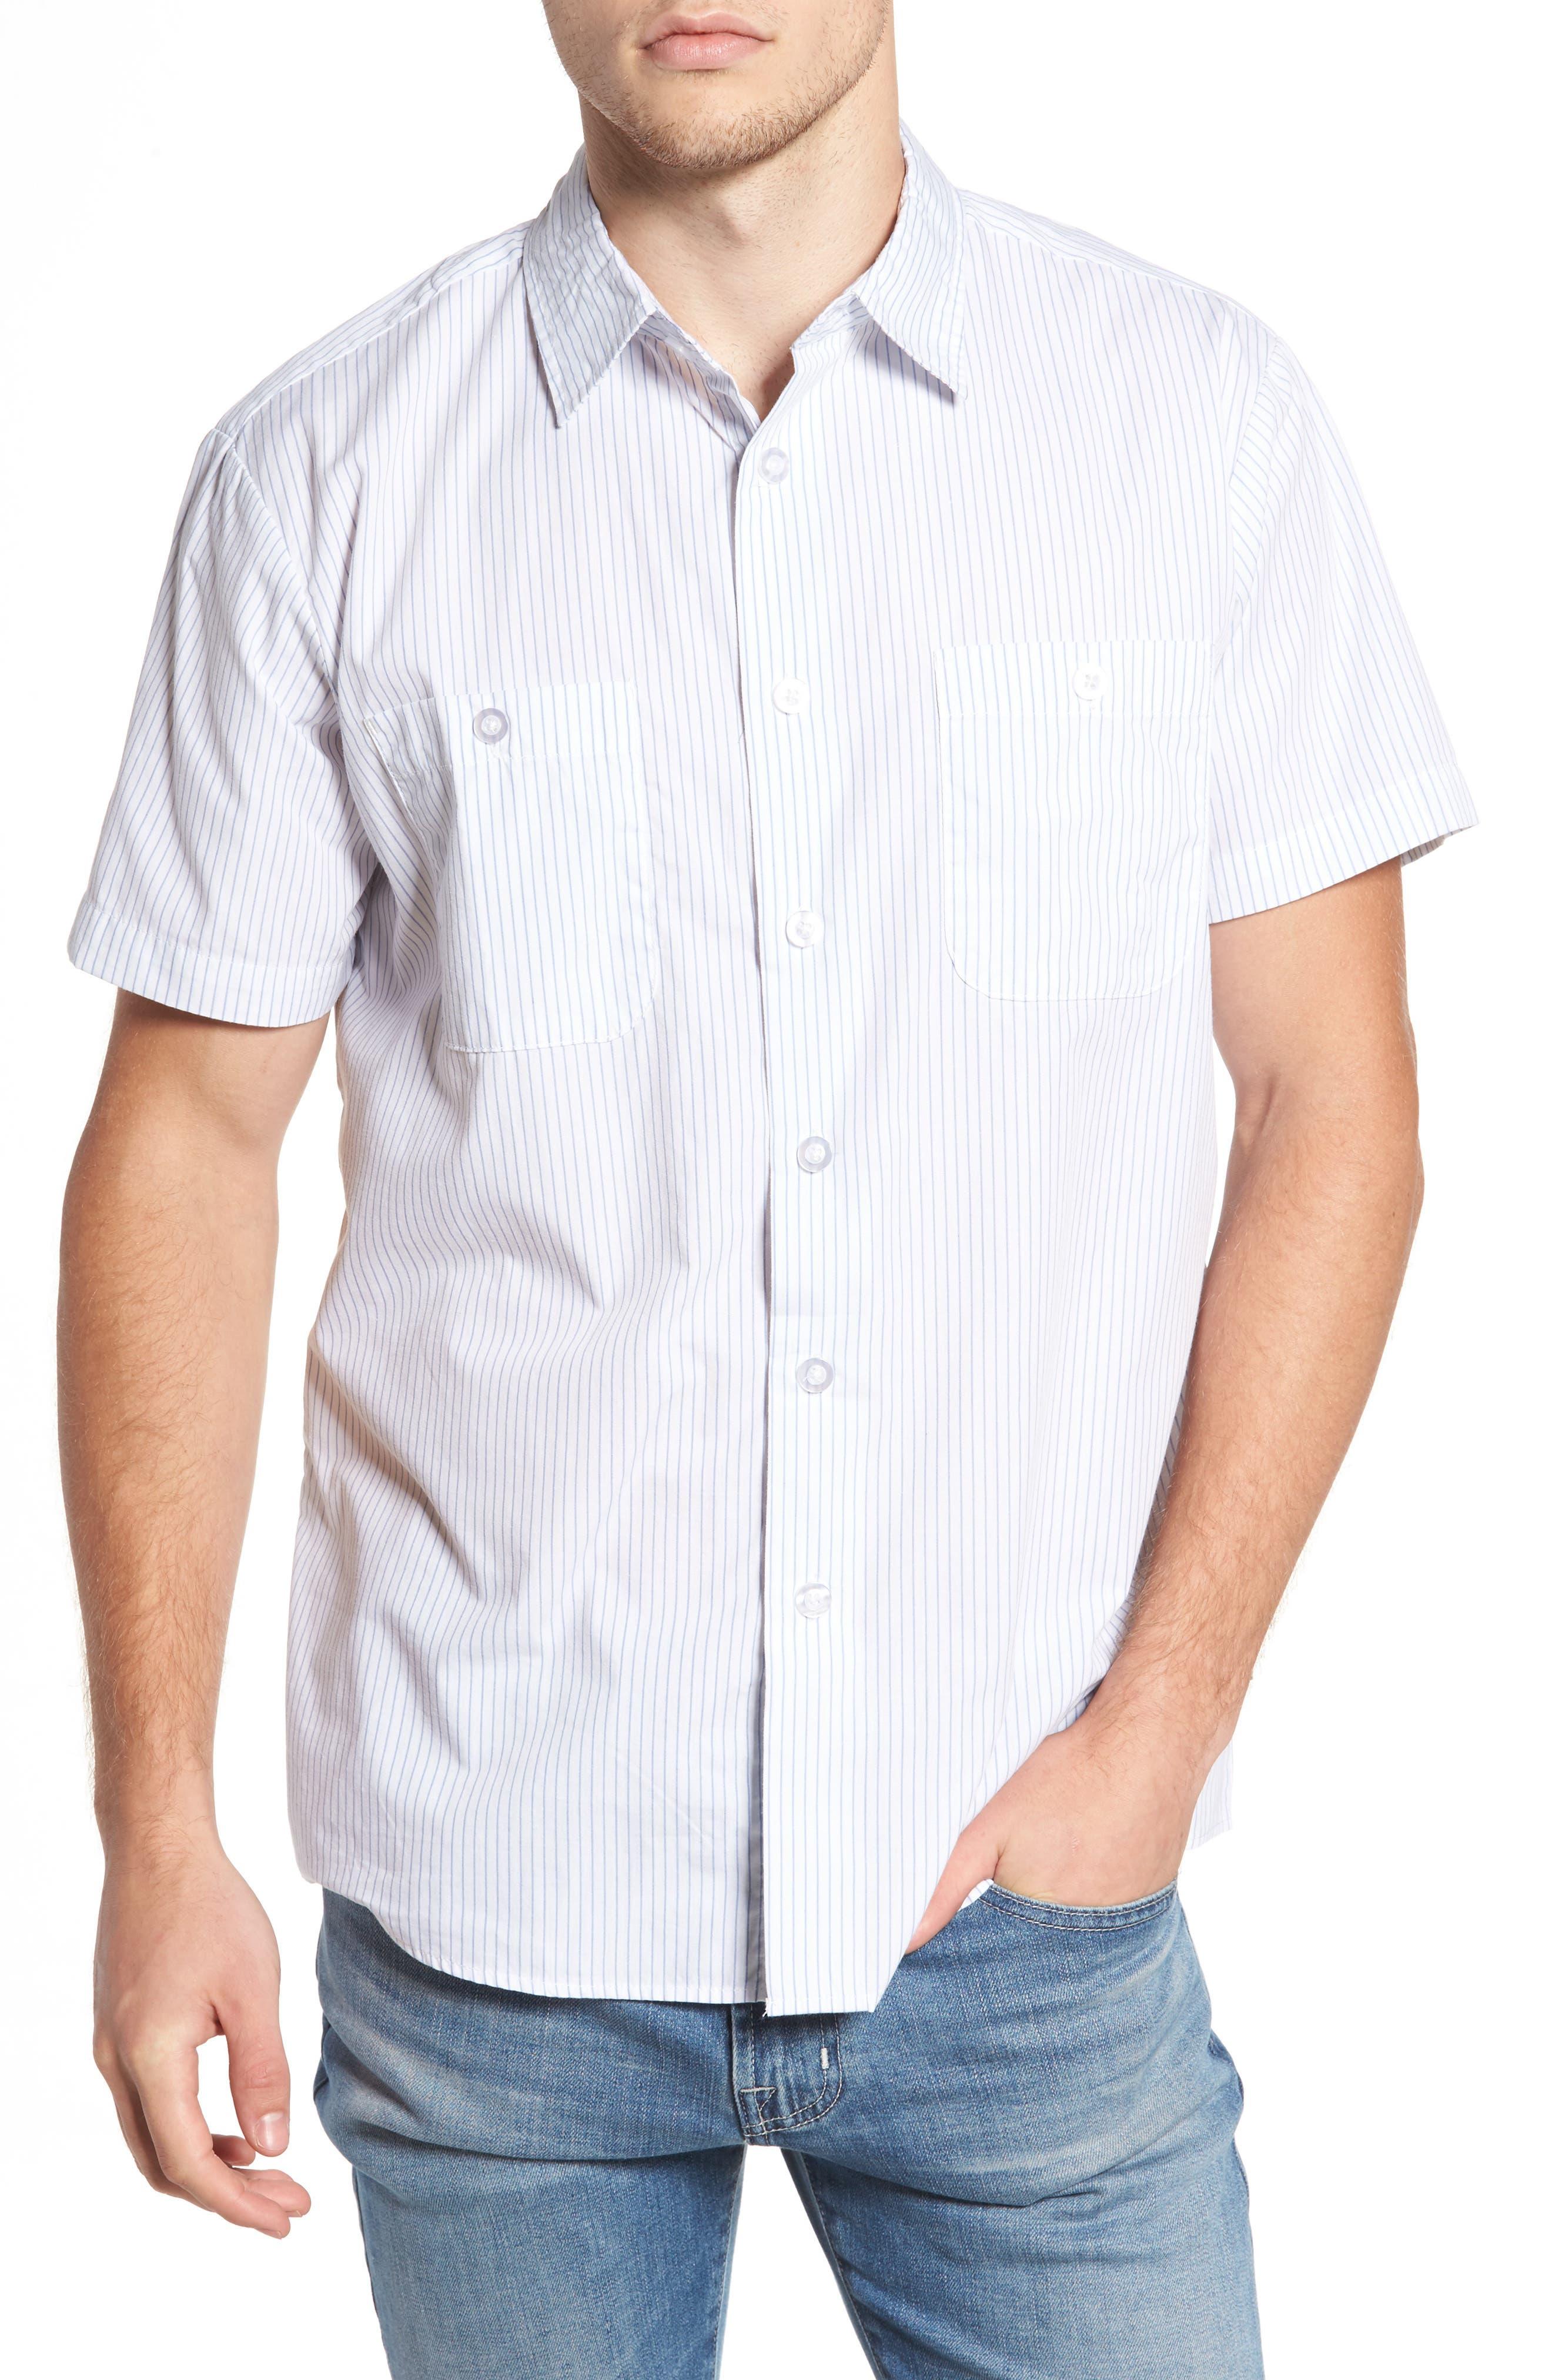 Alternate Image 1 Selected - Brixton Reeve Pinstripe Woven Shirt